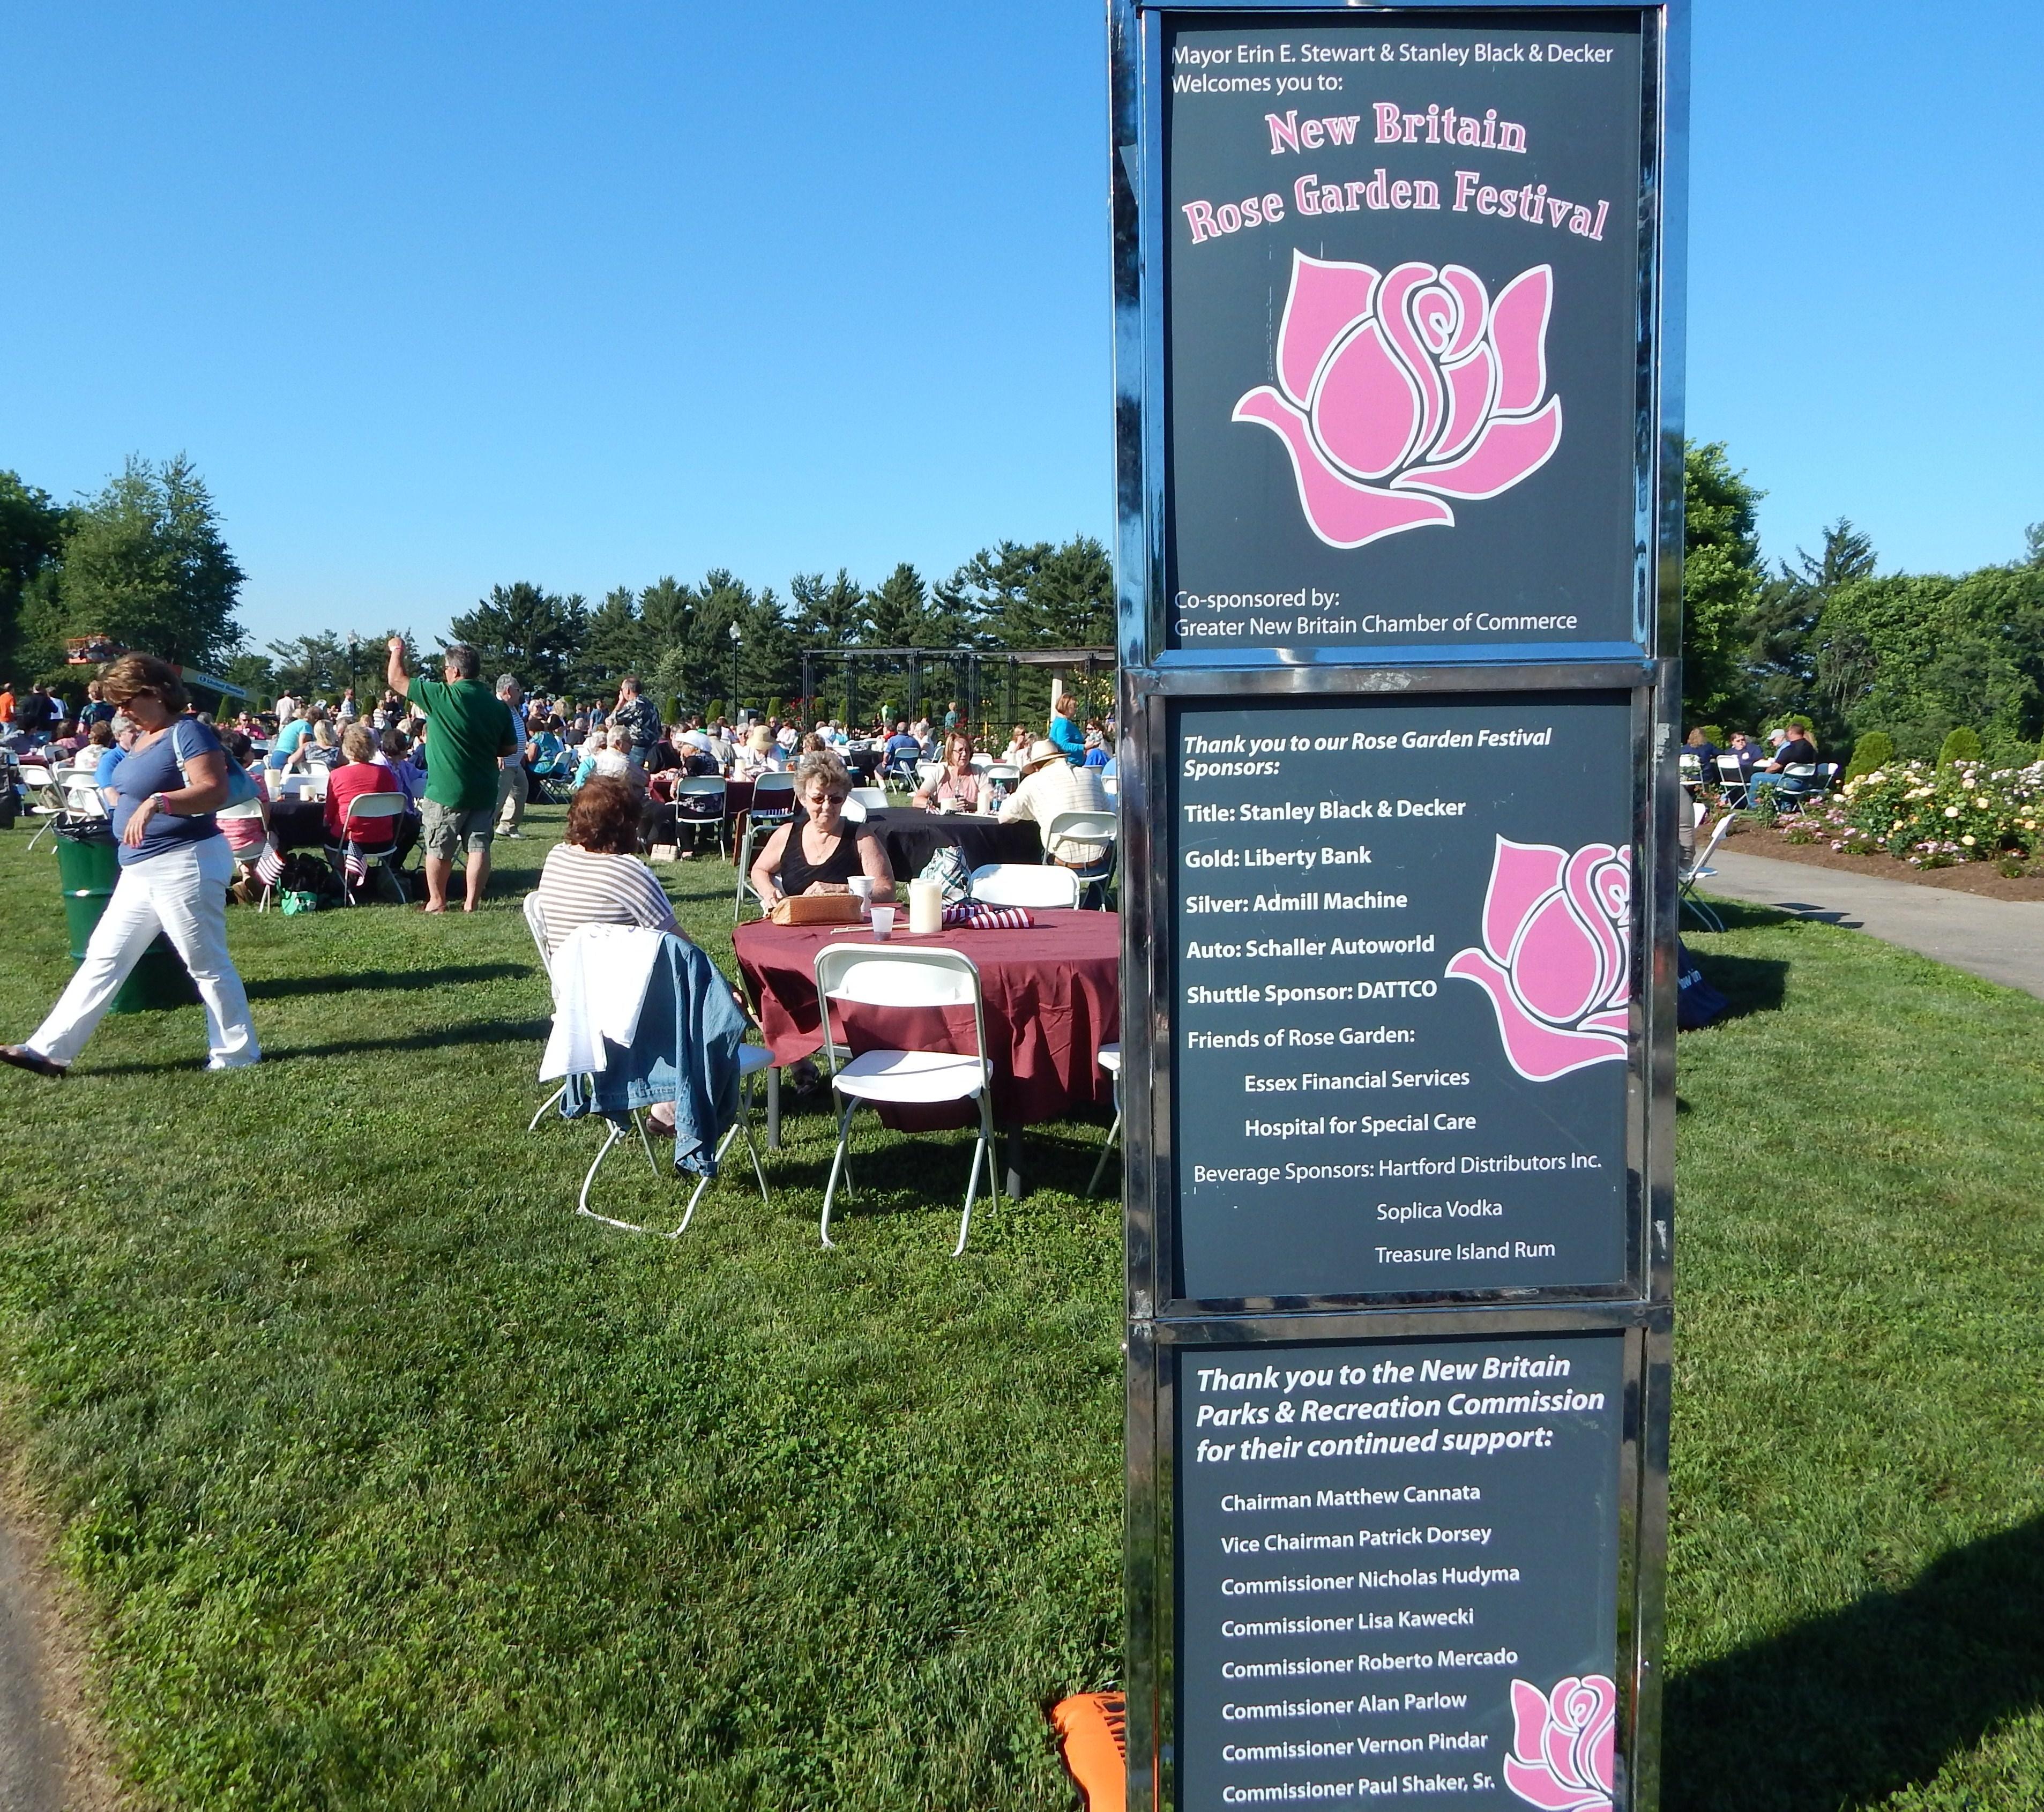 Third Annual Rose Garden Festival